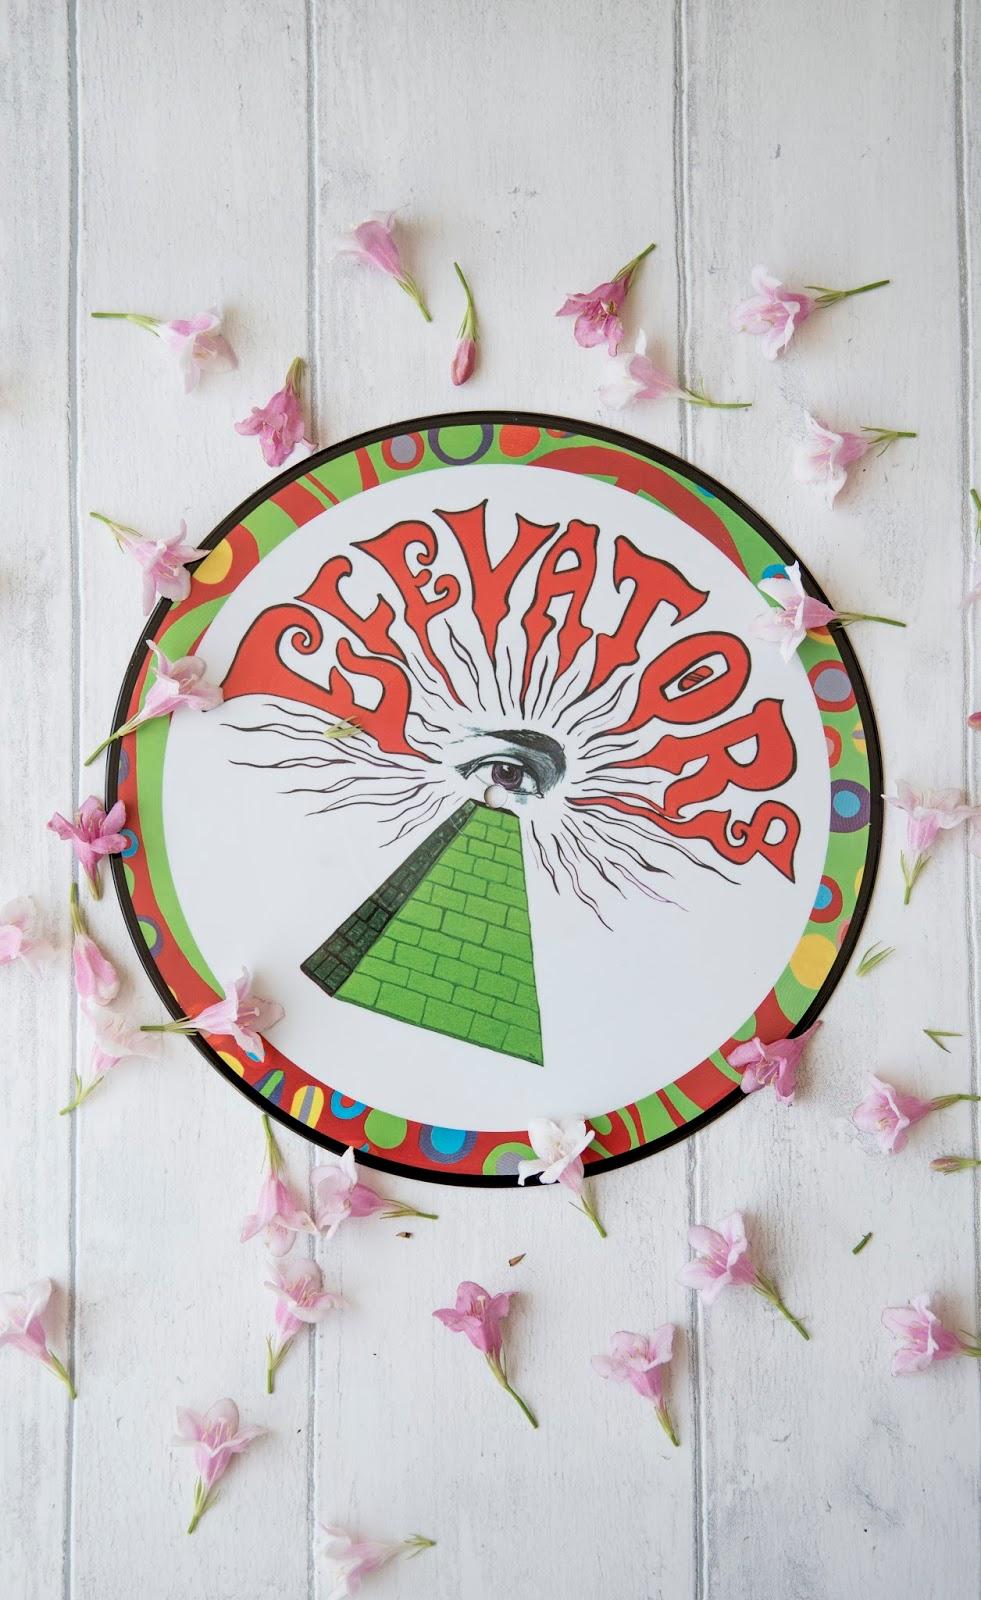 may-beauty-music-favourites